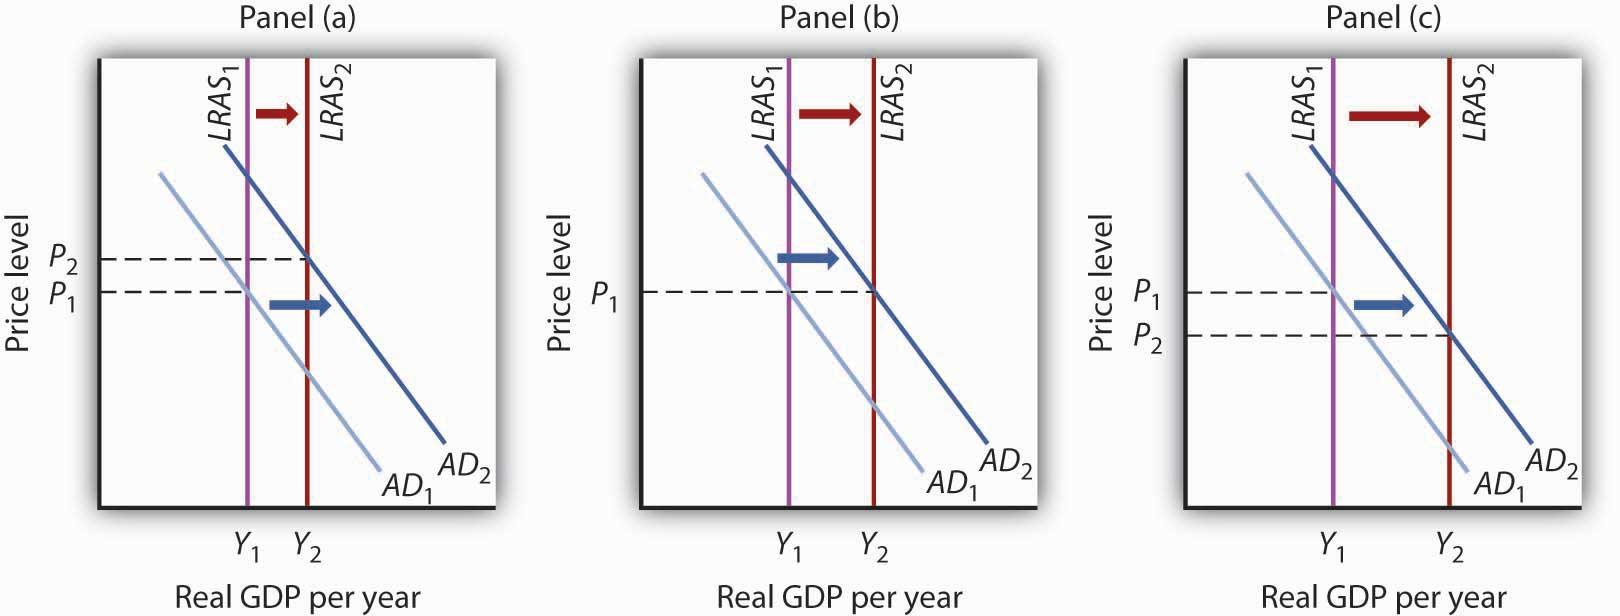 Real GDP per year graphs